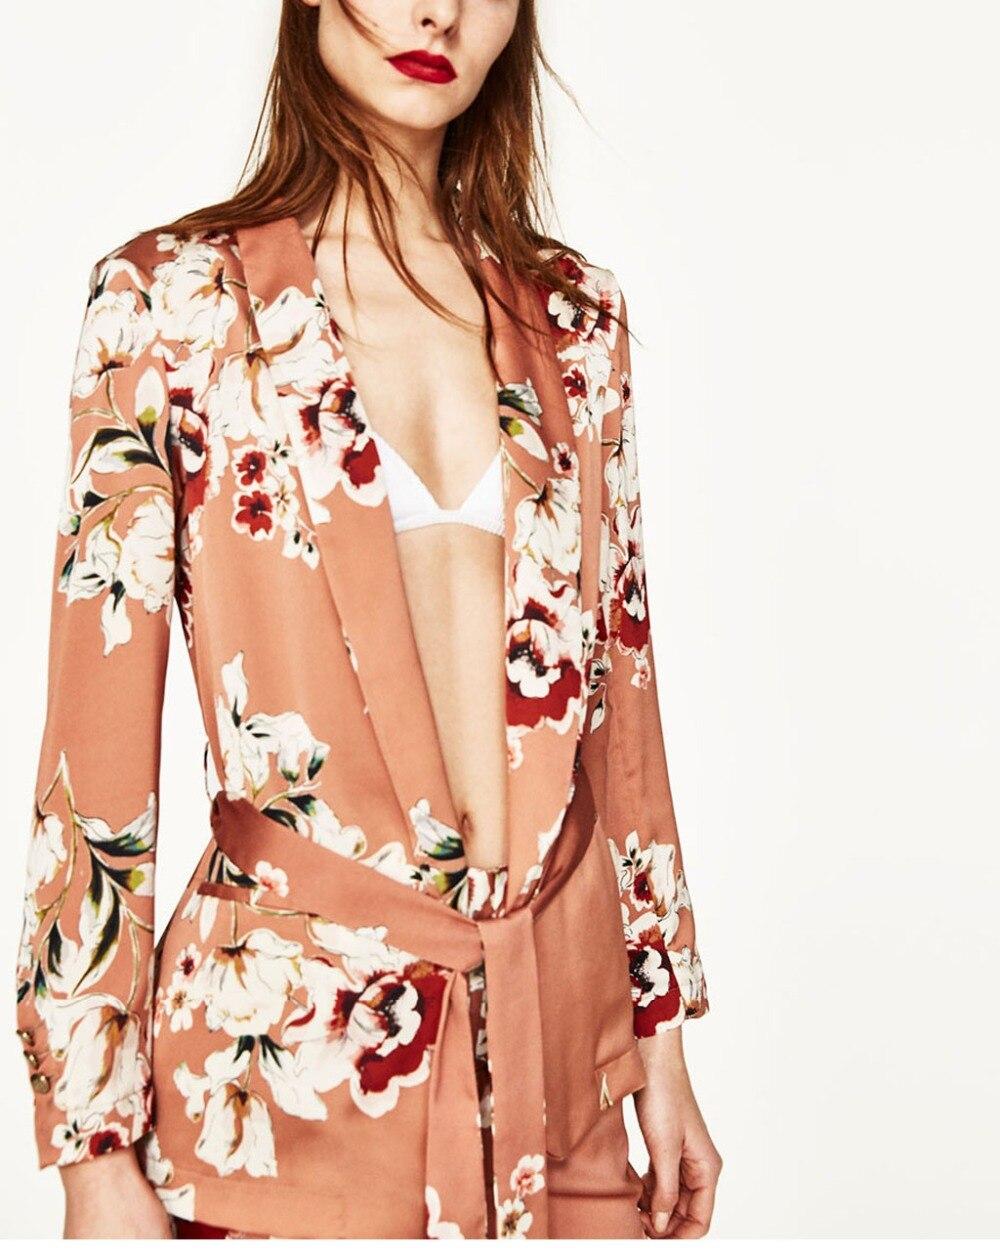 d6a14ddefb4 Ropa de trabajo Blazers Kimono estampado flor Floral fashes traje ...